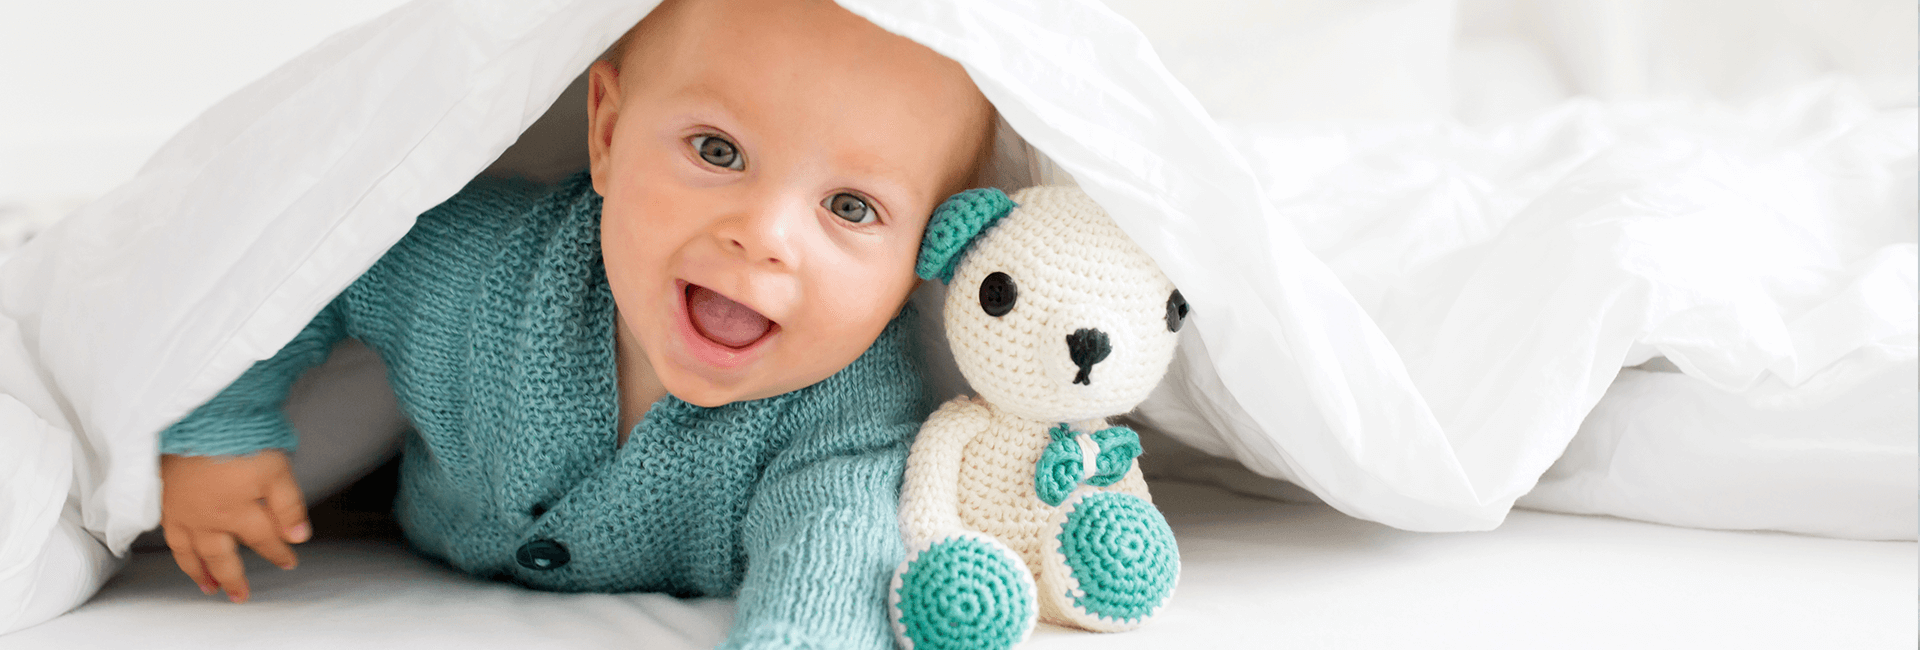 Baby Blanket Gift Basket